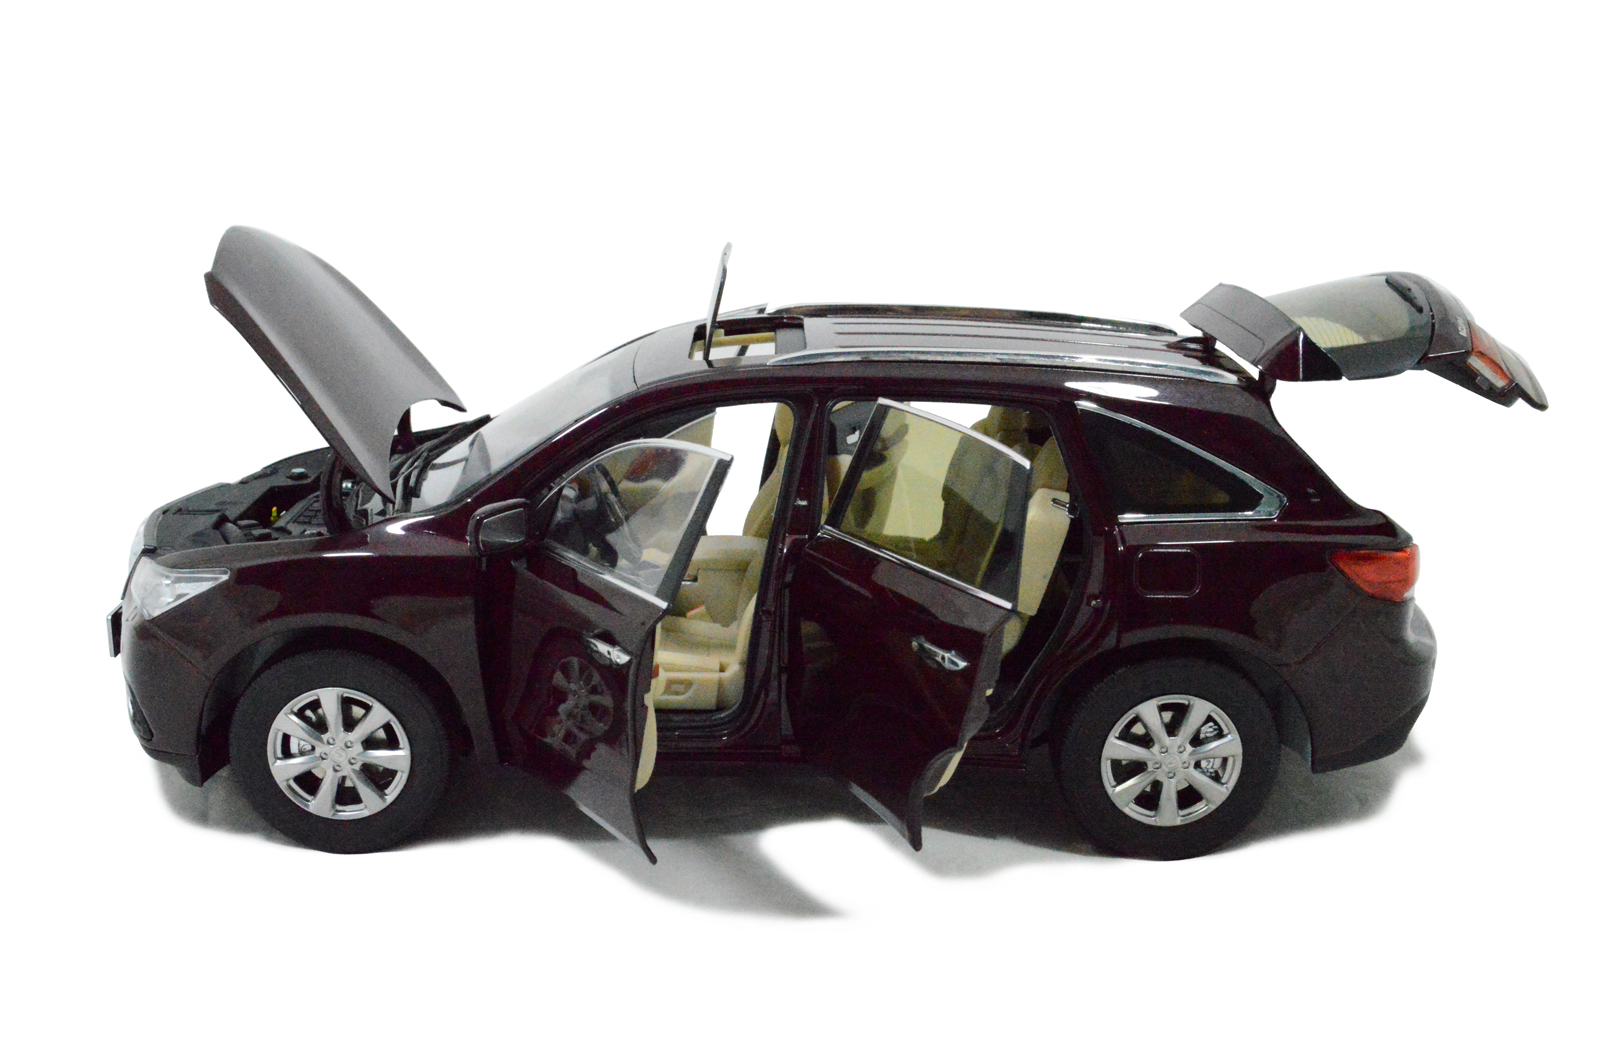 Acura Mdx 2016 1 18 Scale Diecast Model Car Wholesale Paudi Model